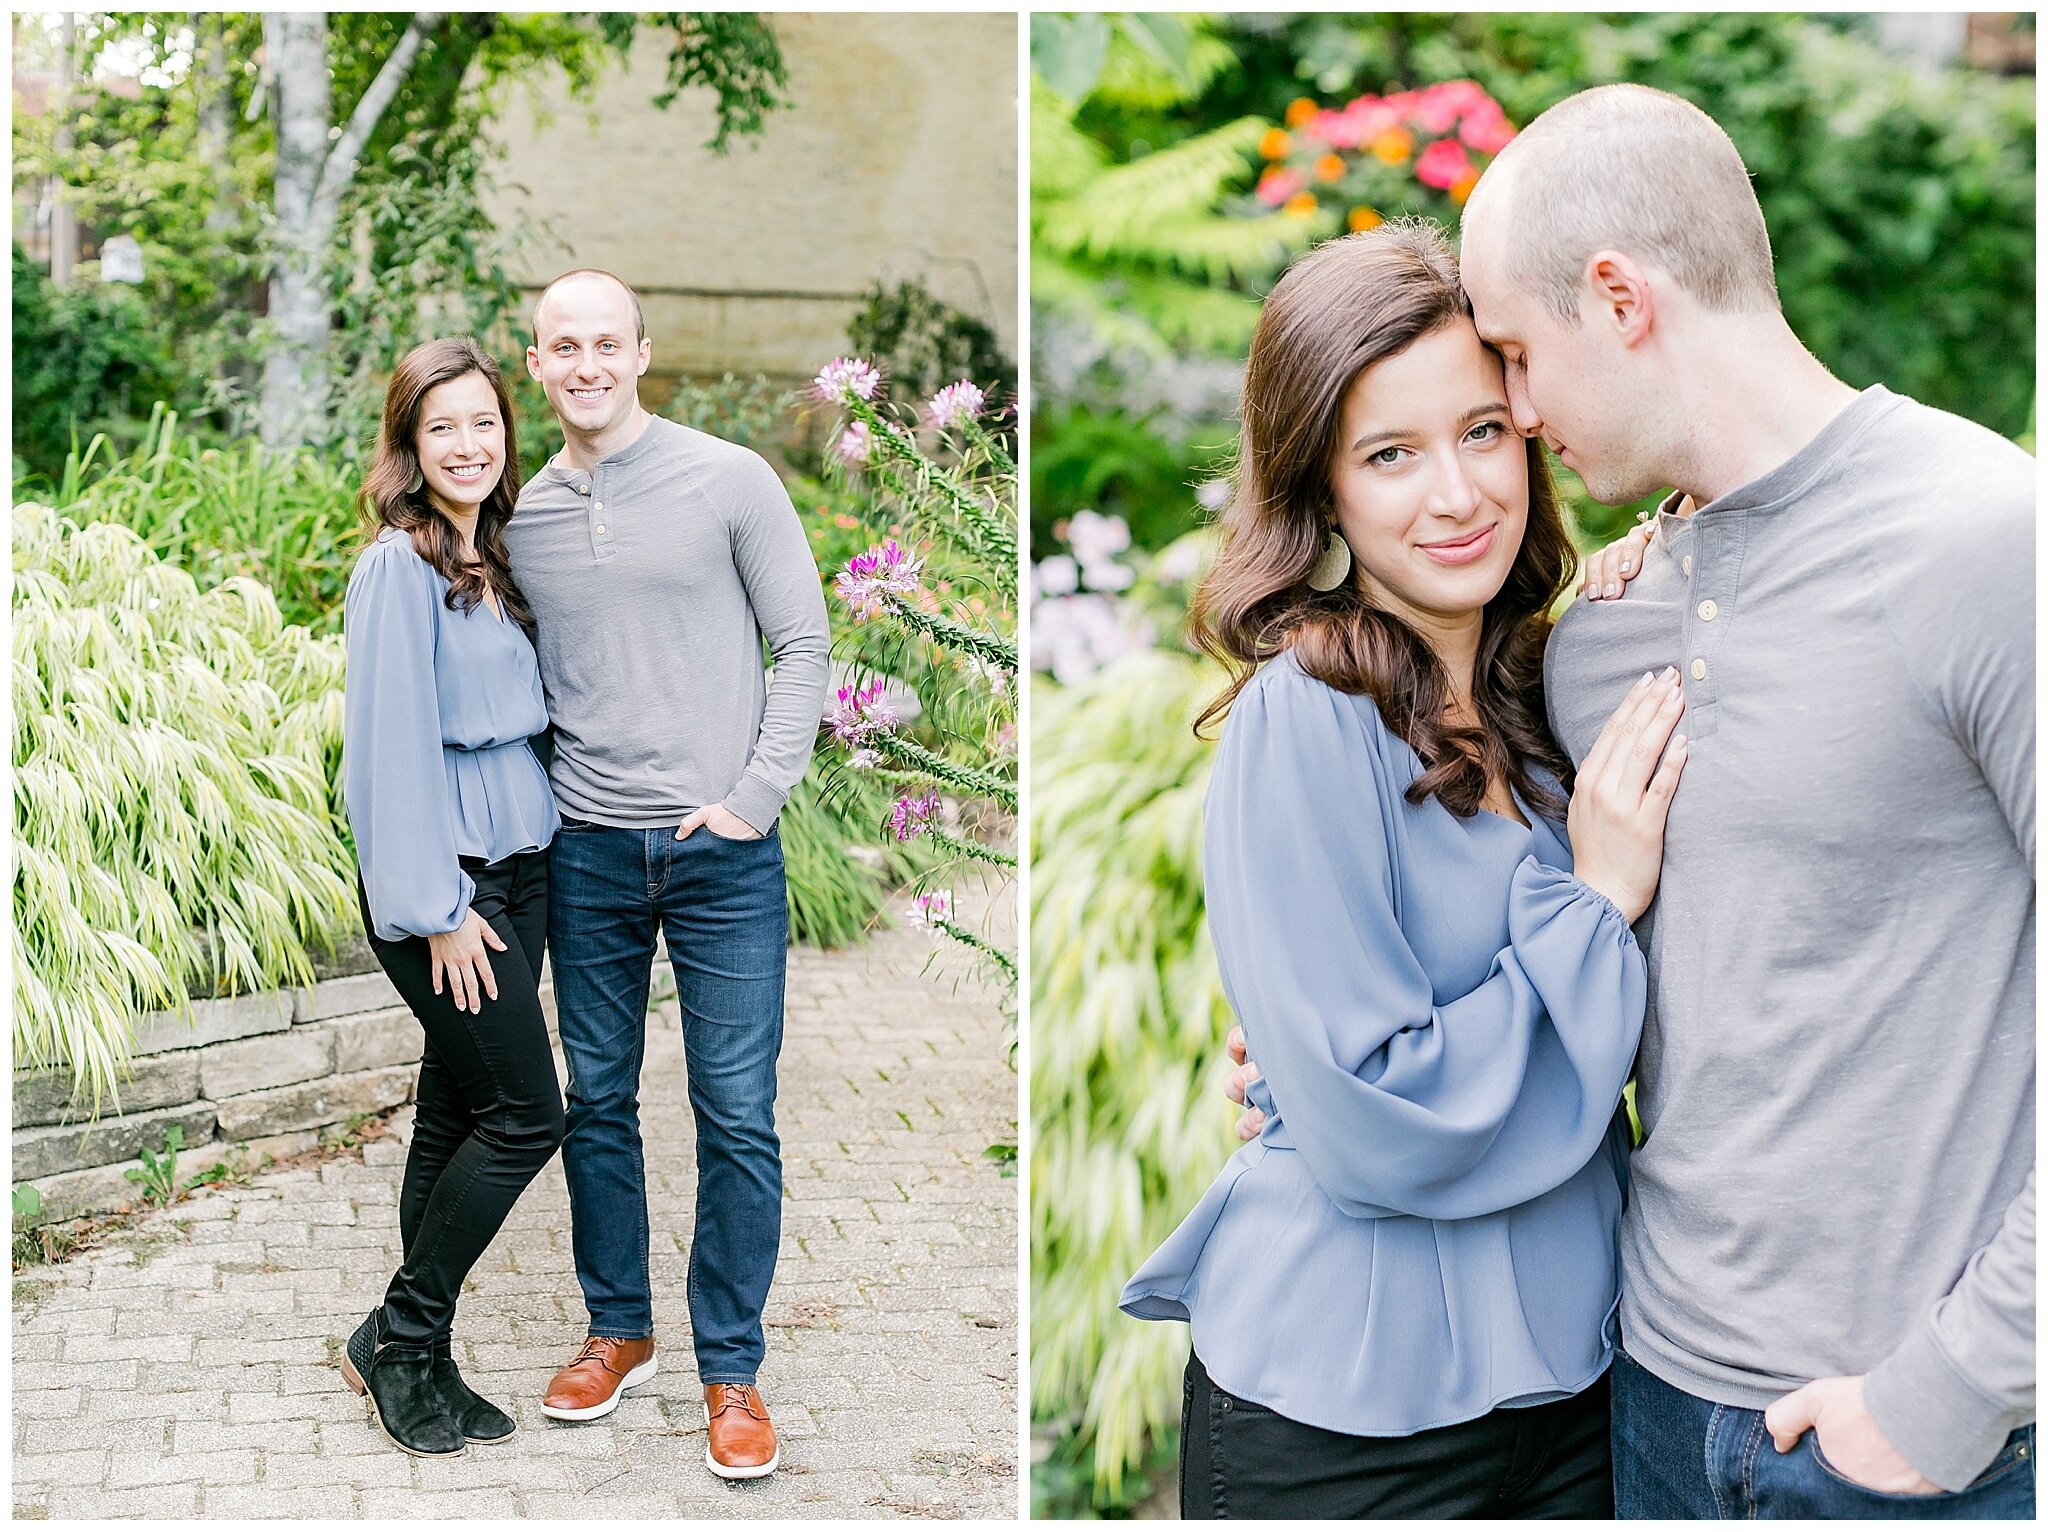 period_park_engagement_session_madison_wisconsin_wedding_photographers_0179.jpg